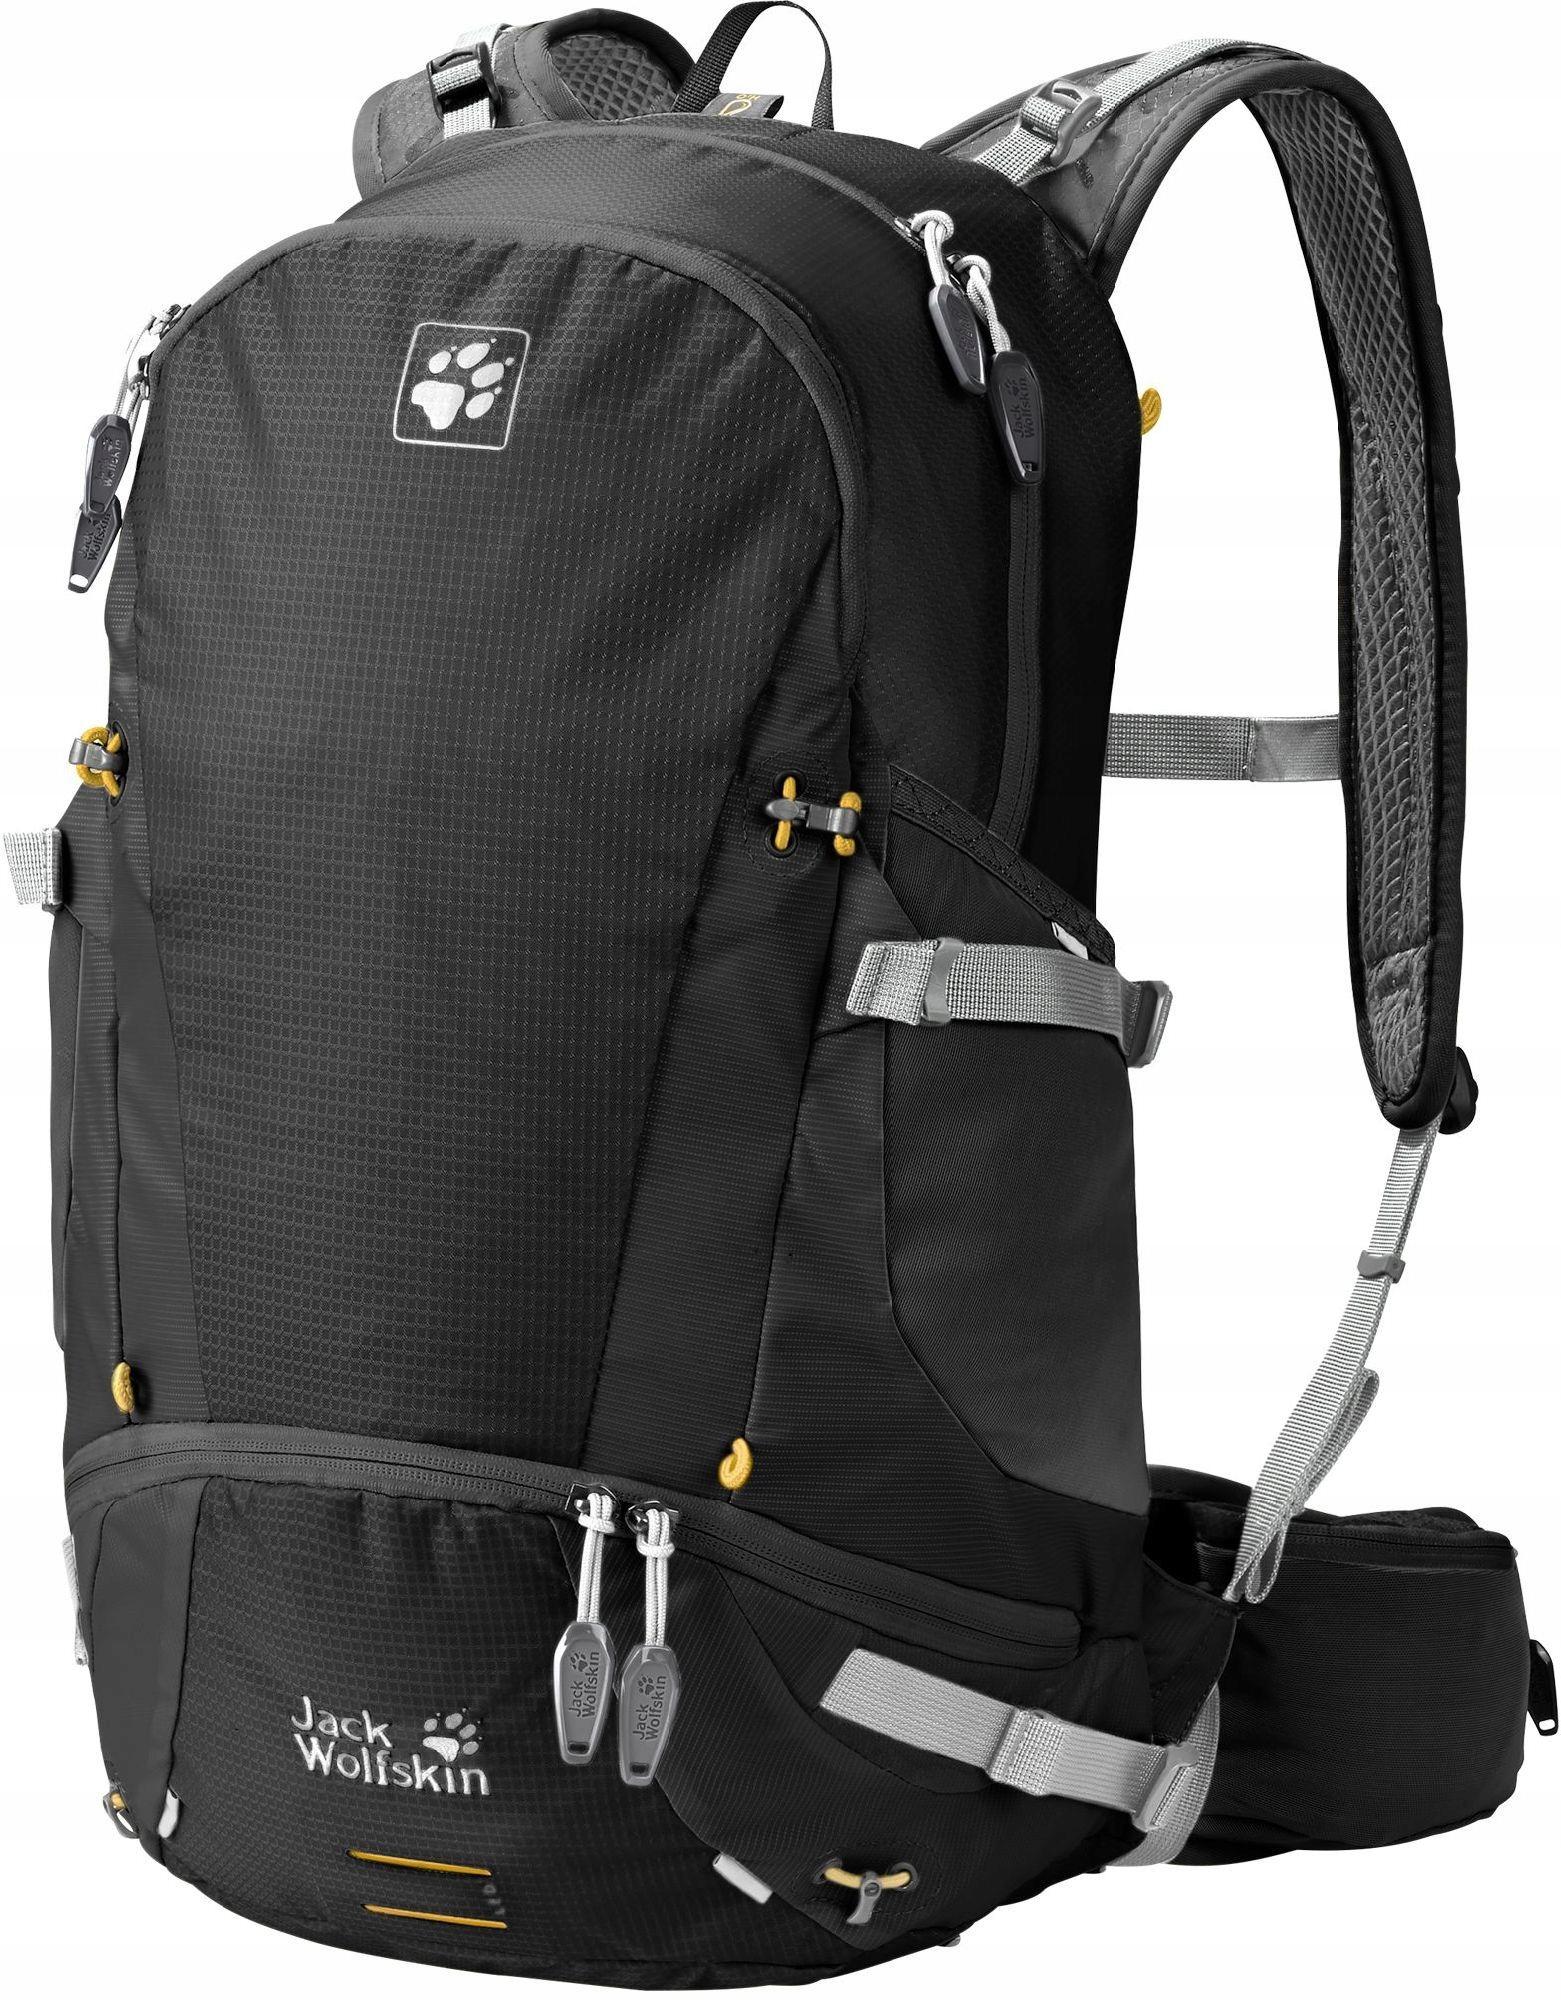 Jack Wolfskin Plecak Moab Jam 30 Black (2002293-60